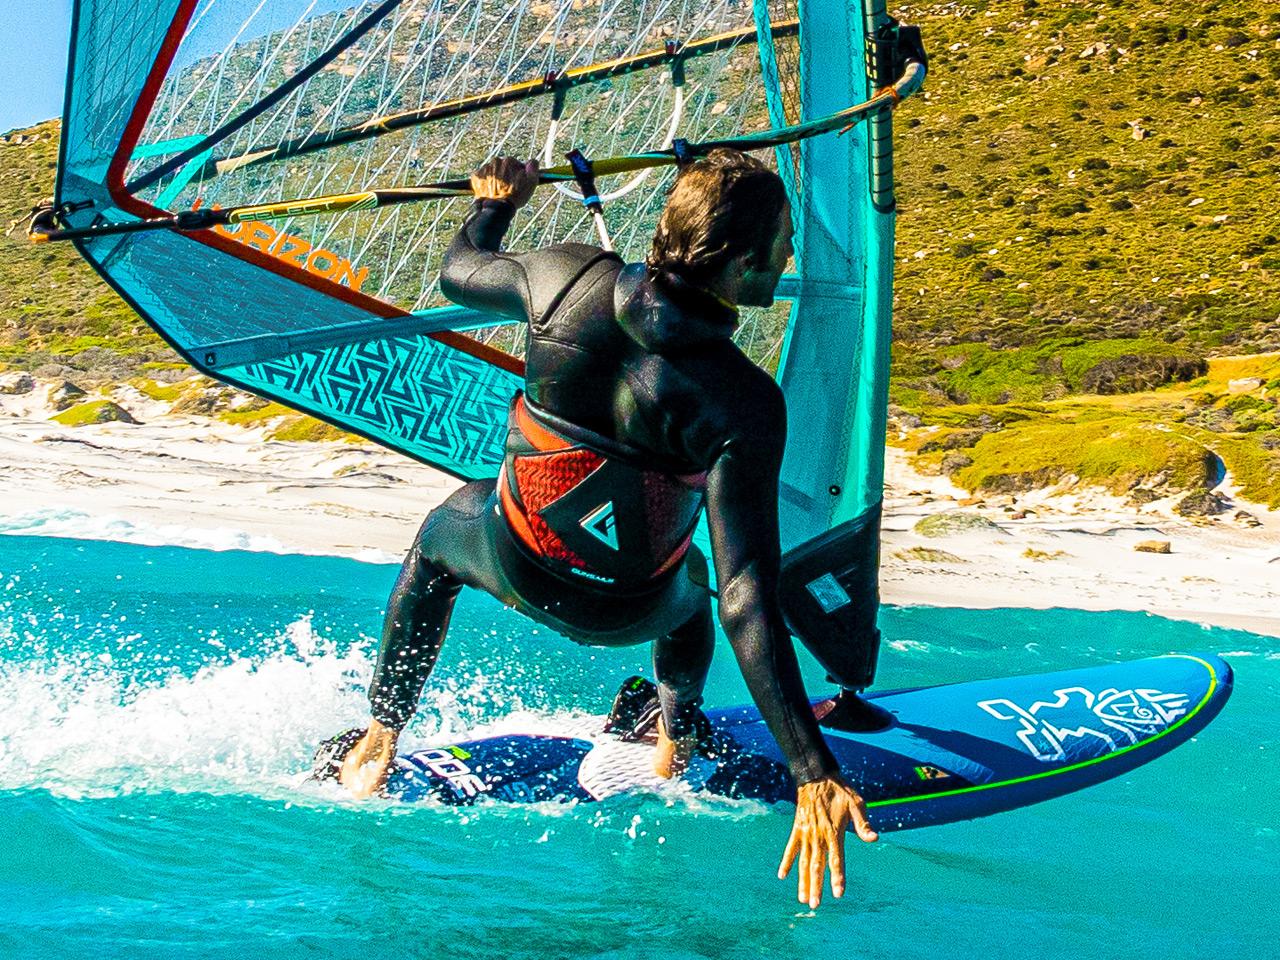 Windsurf Hüfttrapez Freeride